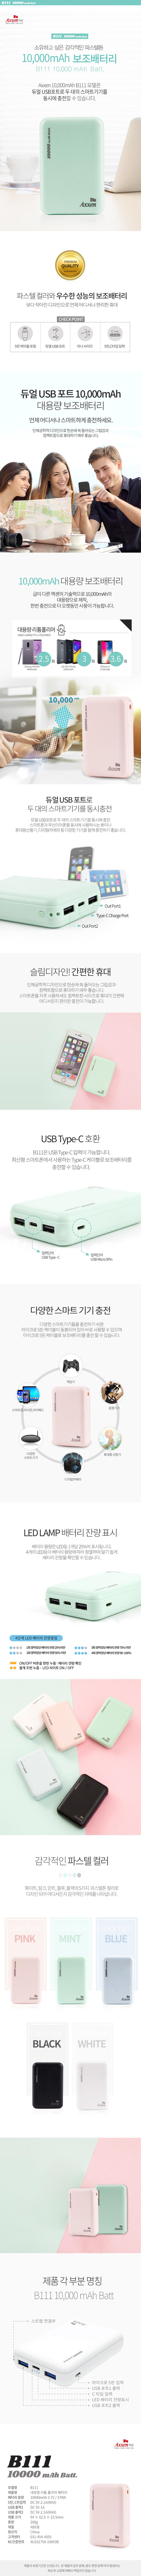 [AXXEN] B111 휴대용 보조배터리 10000mAh 듀얼포트 [화이트]